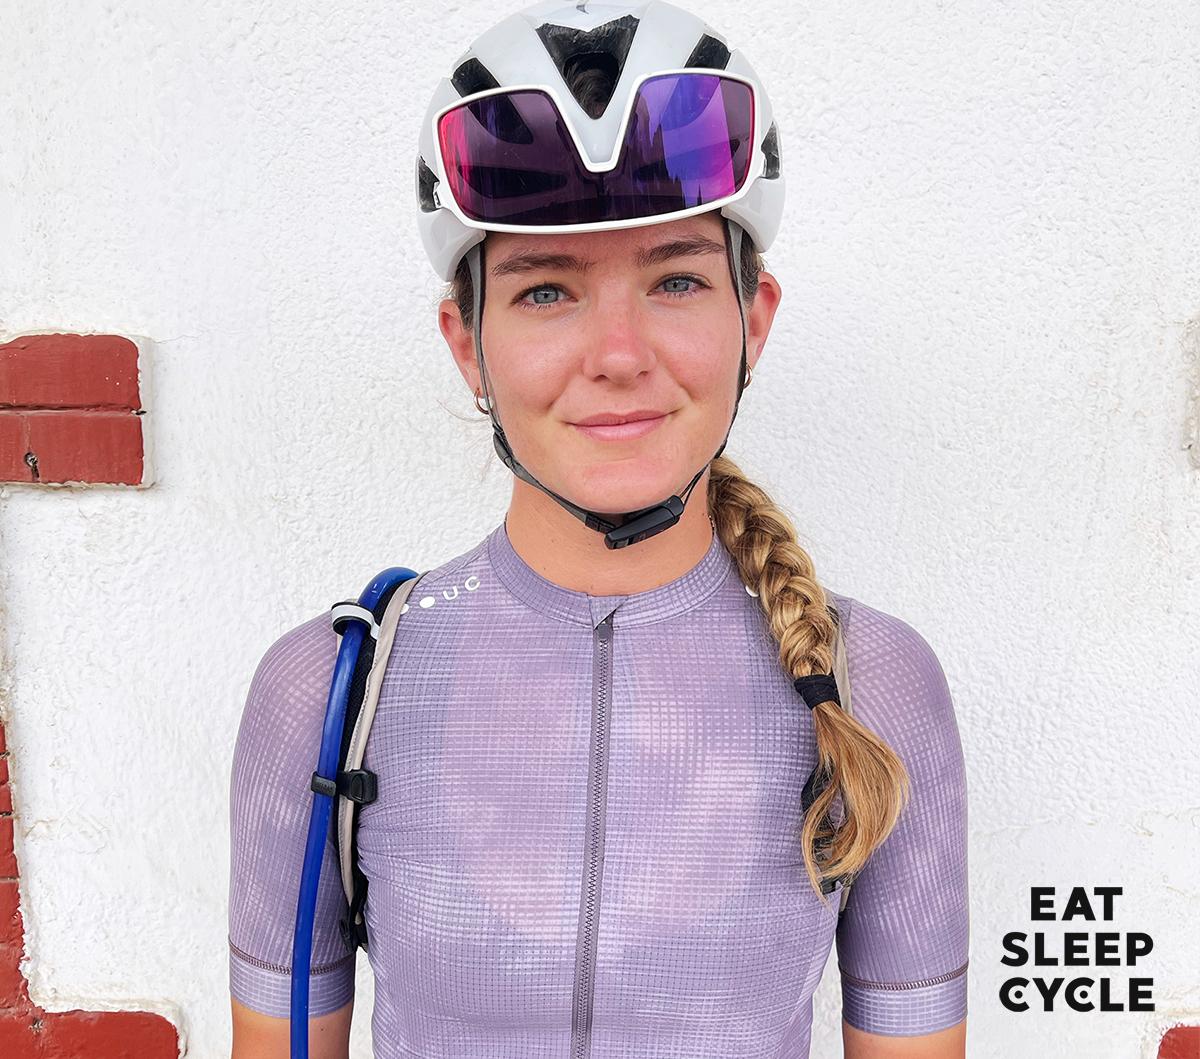 Eat-Sleep-Cycle-Badlands-Gravel-Cycling-Rocket-Rawrrs